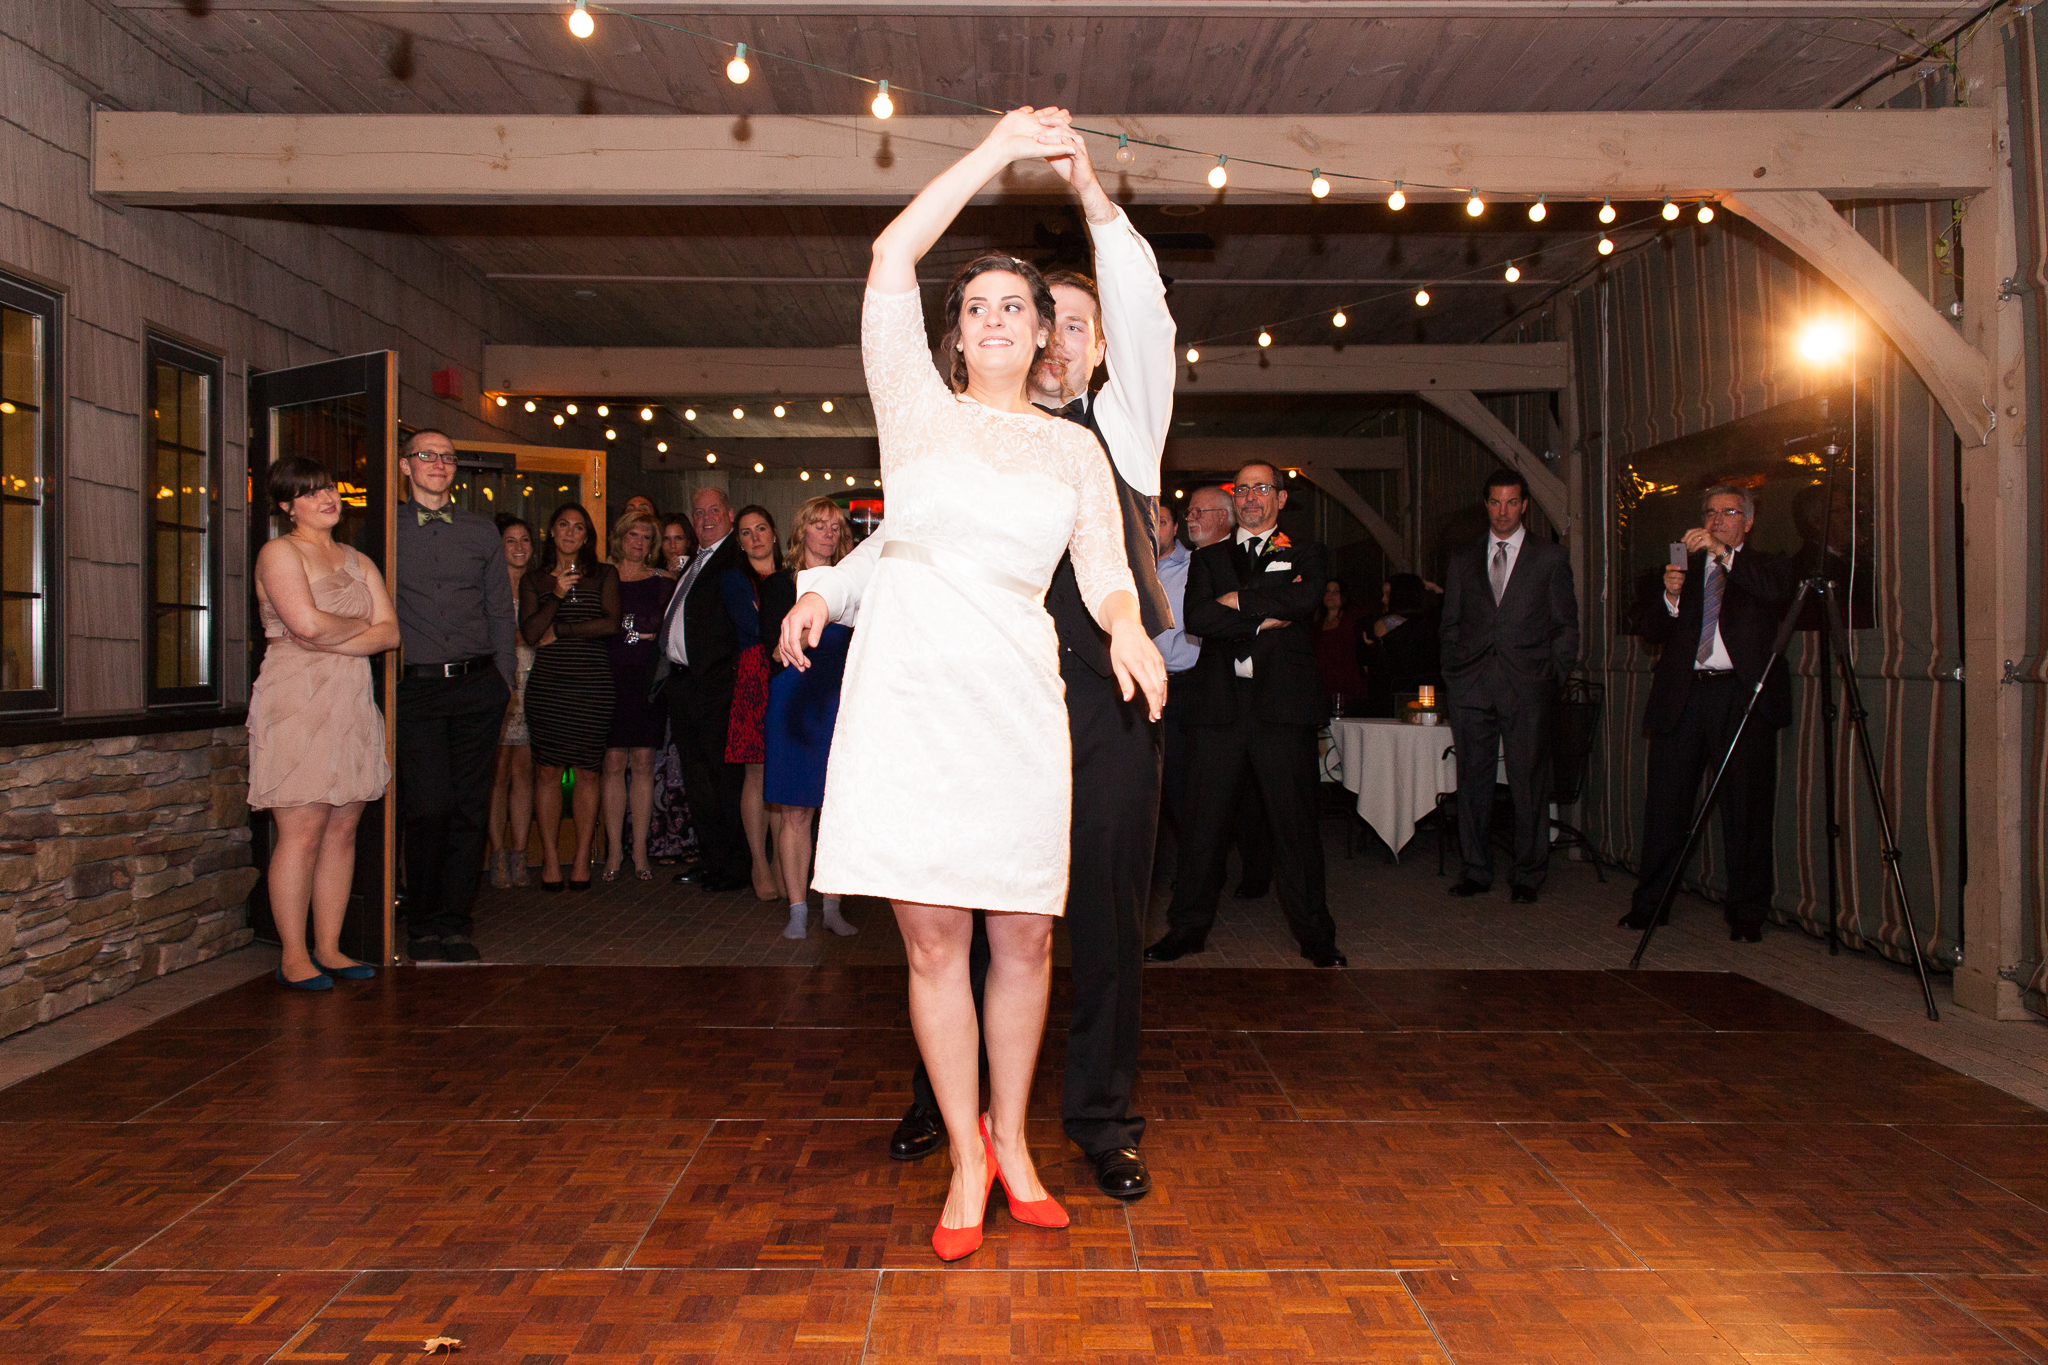 camuglia-whomstudio-chelsea_and_andy-nycphotographer-wedding-brooklyn-buffalo-timberlodge-113-0749.jpg